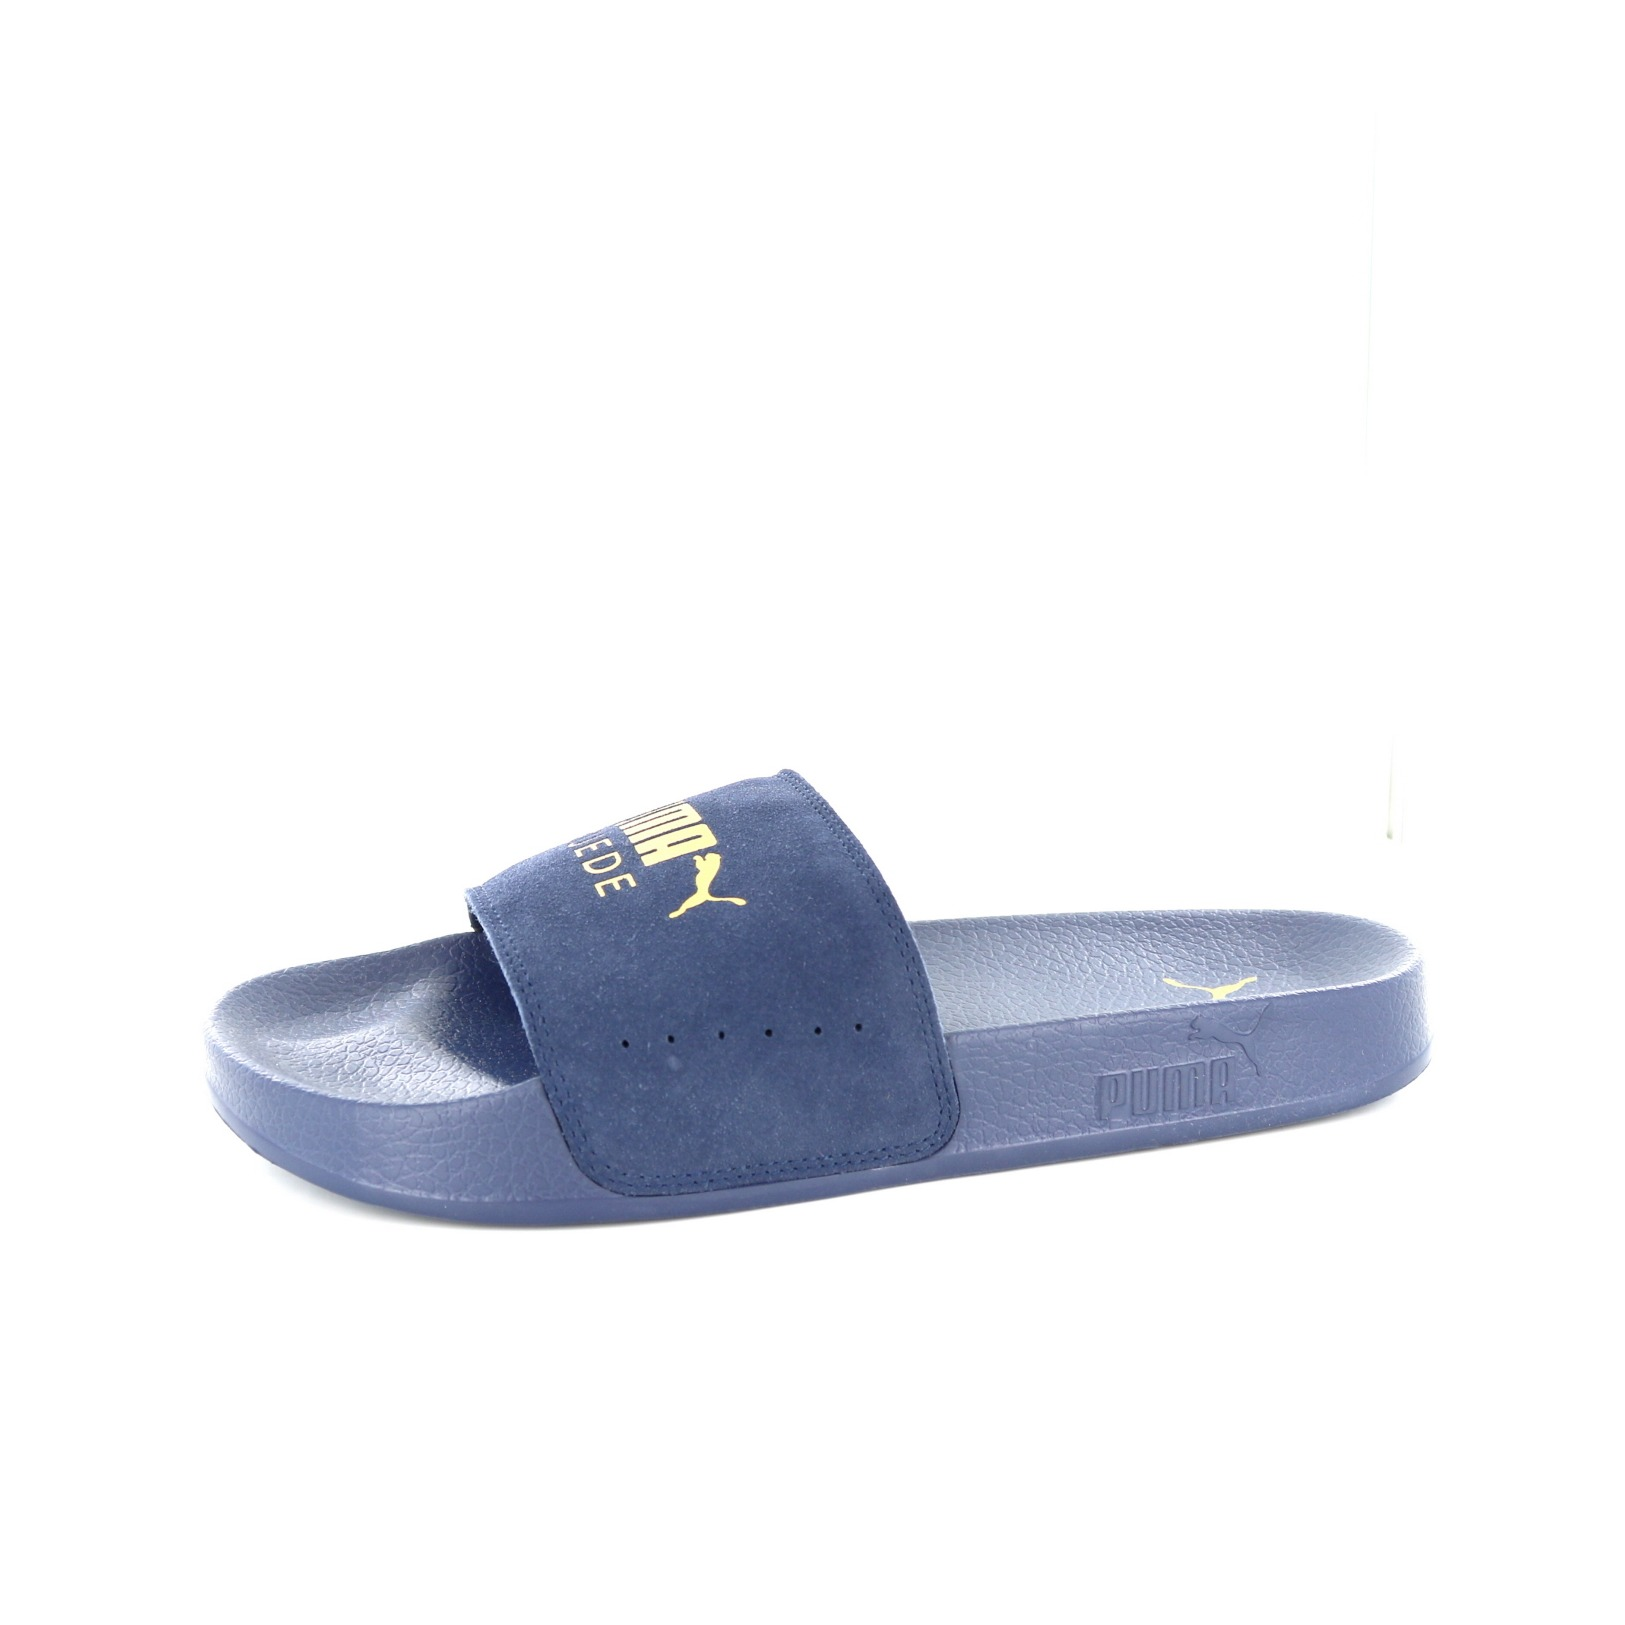 Puma / Pantofole, Blu